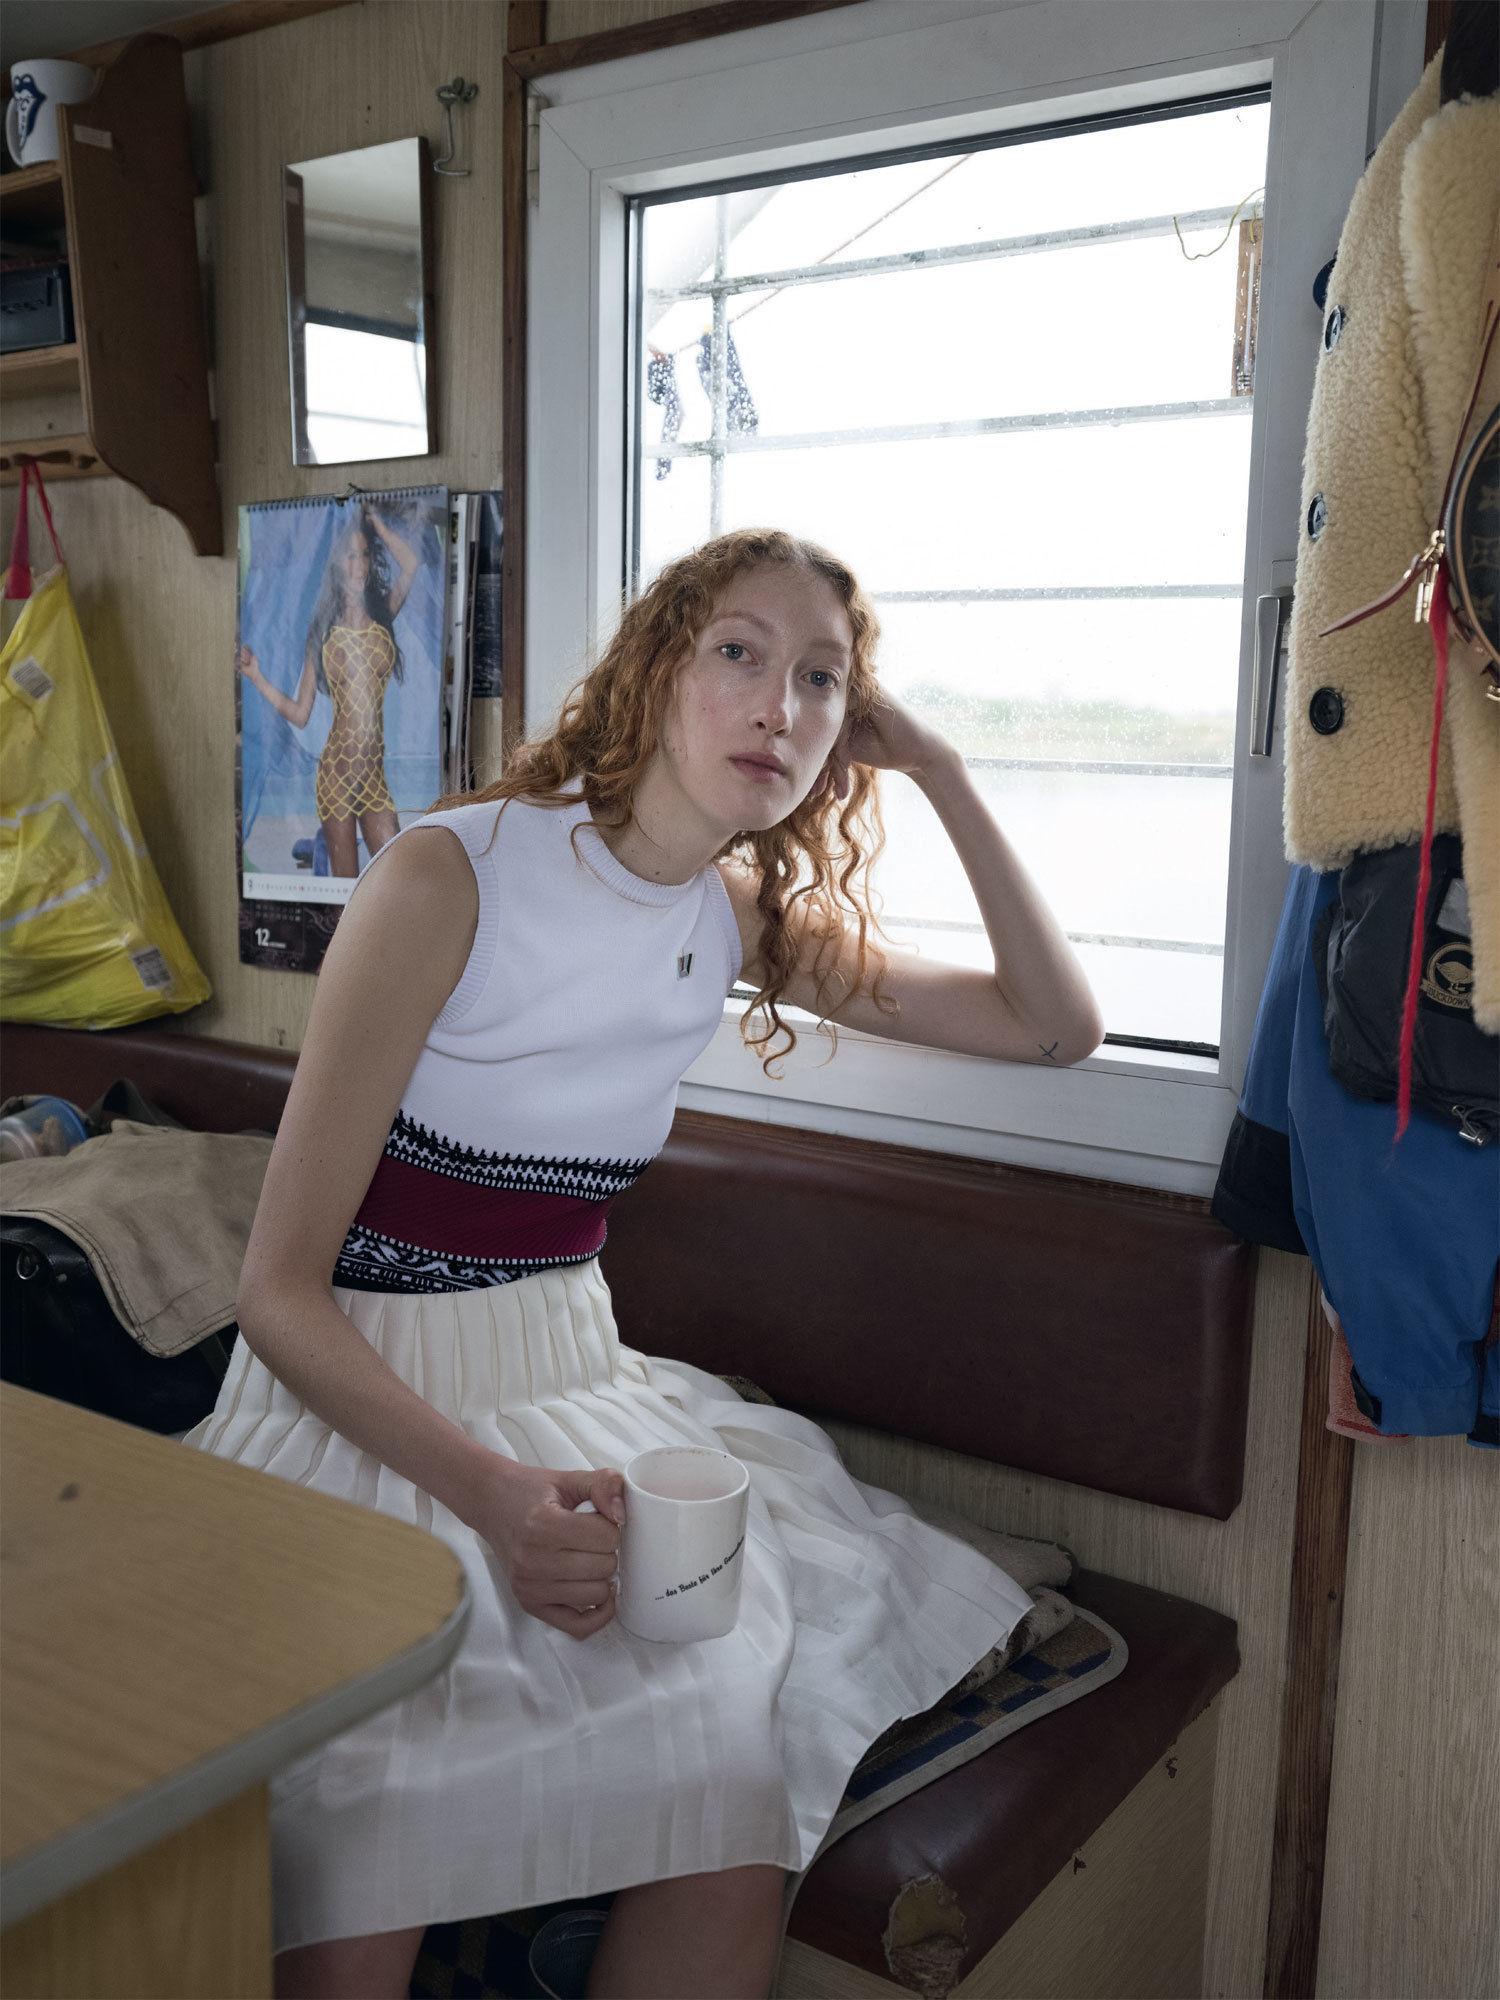 LIGANORD ARTIST HELENA NARRA / HAIR MAKE-UP - NUMÉRO